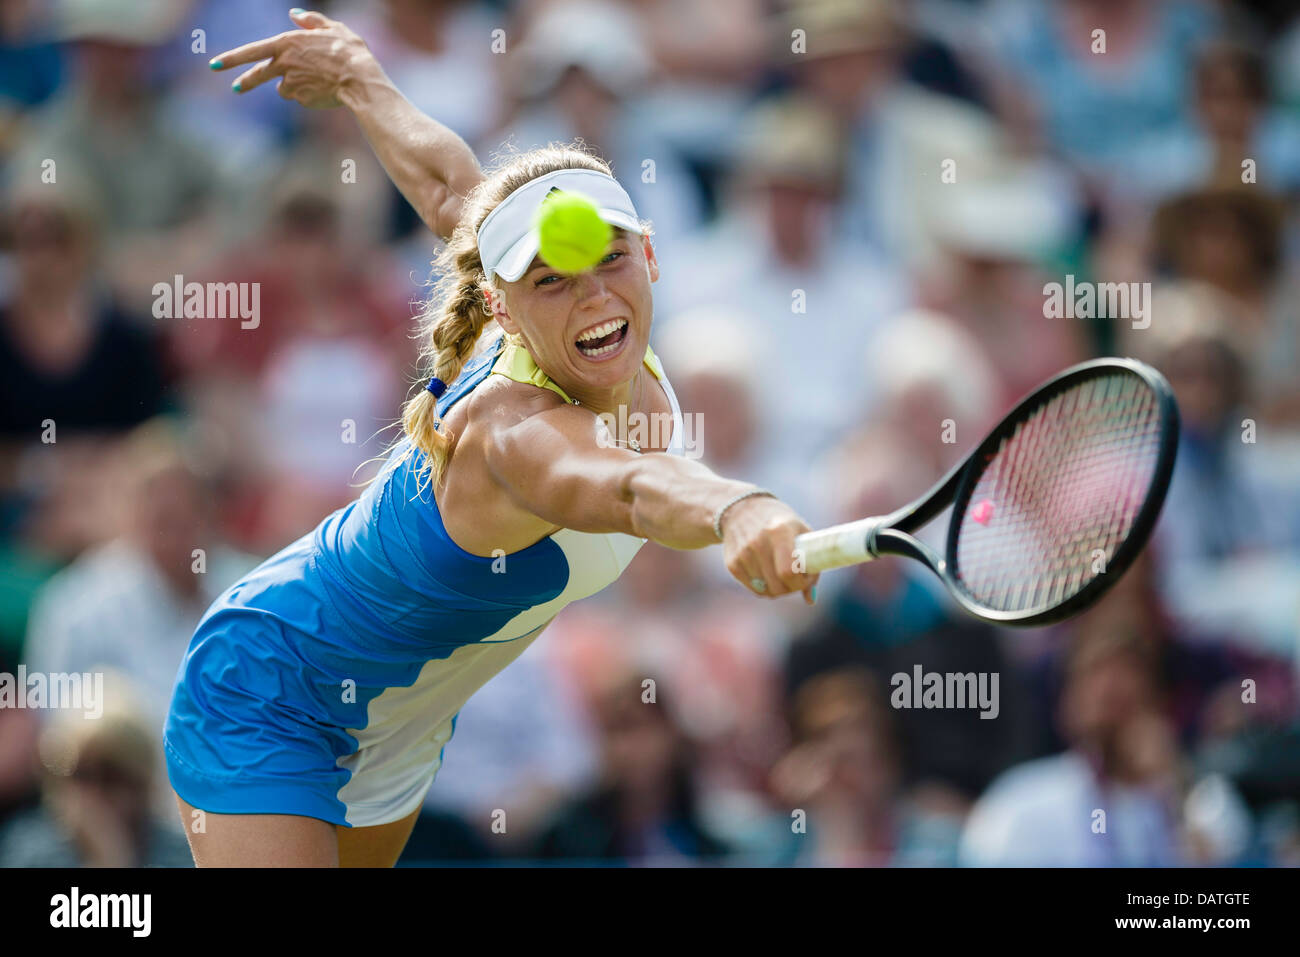 Caroline Wozniacki of Denmark in action during singles match - Stock Image